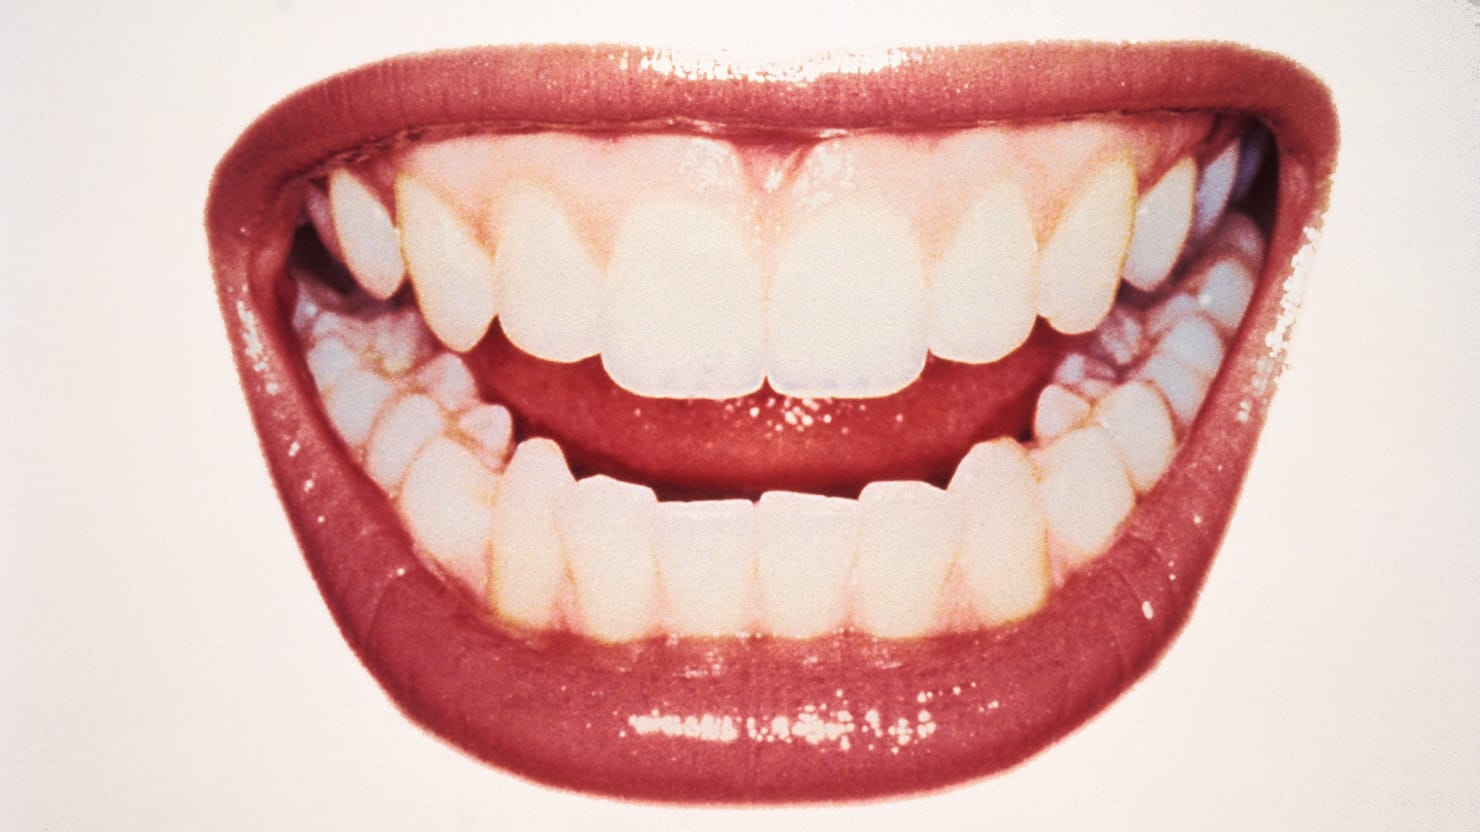 close up of grinning mouth teeth millennial pink gums micro robots microorganism gum dentist dental